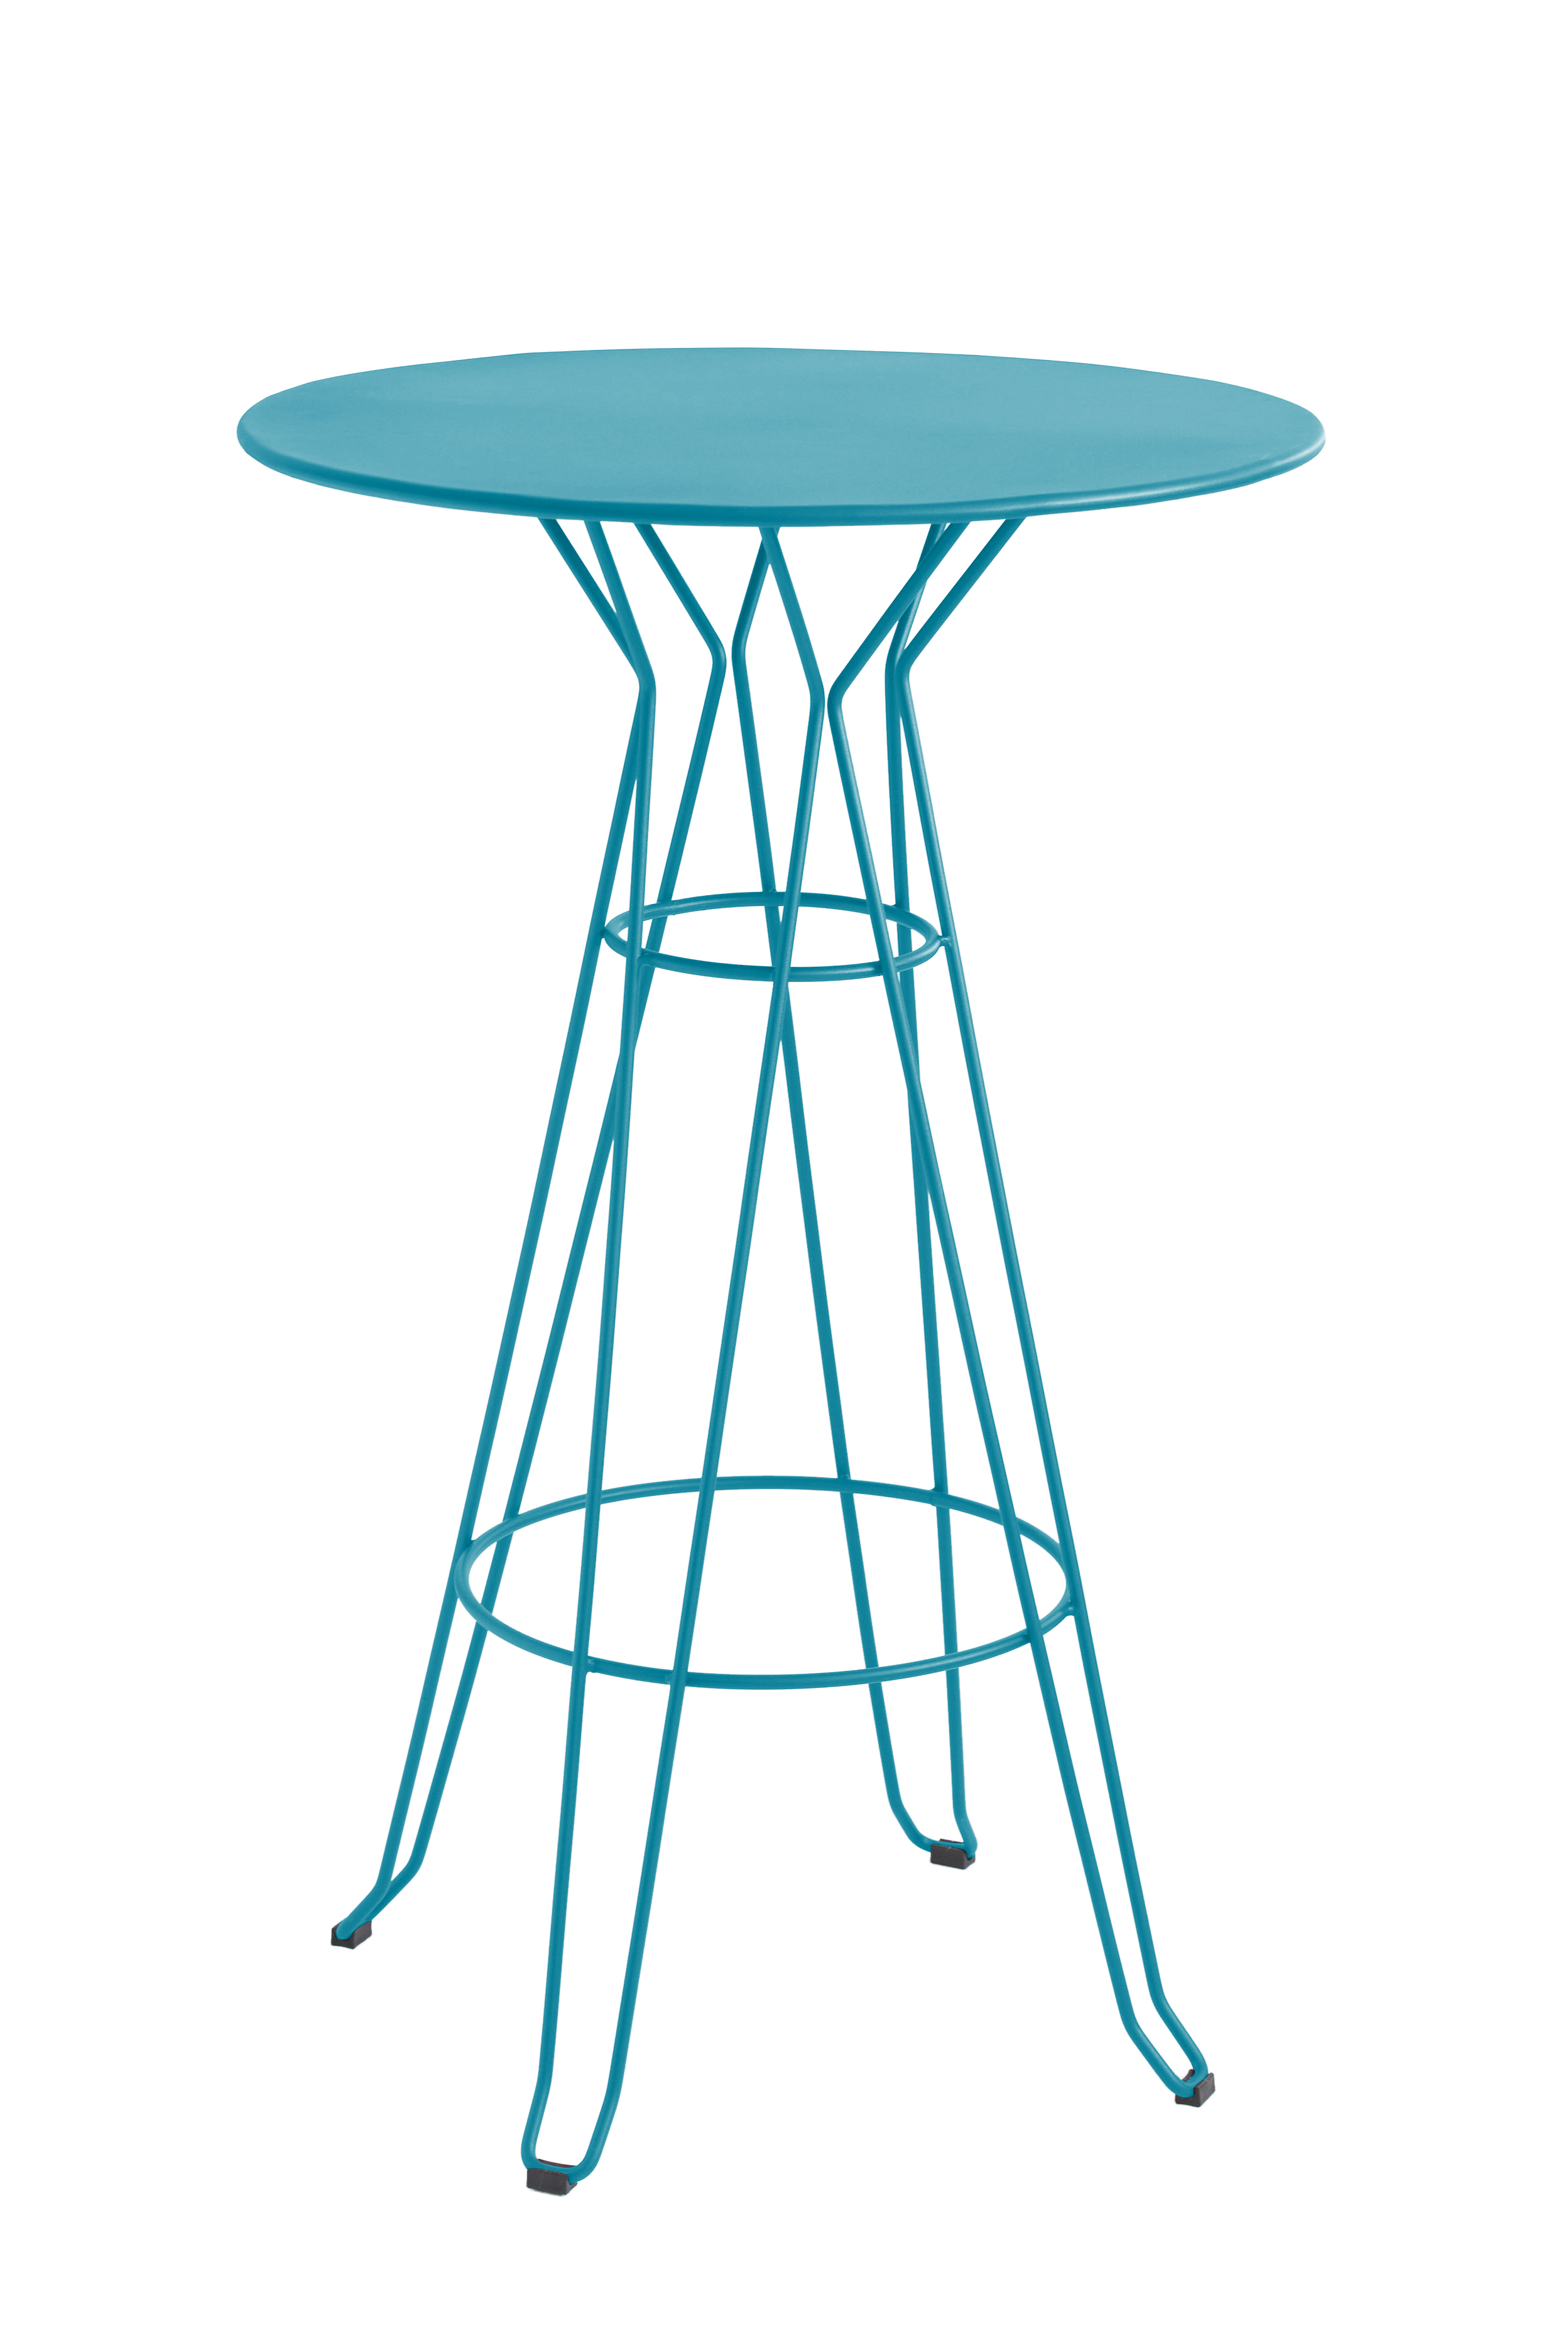 CAPRI - Table rond haute en acier bleu D80